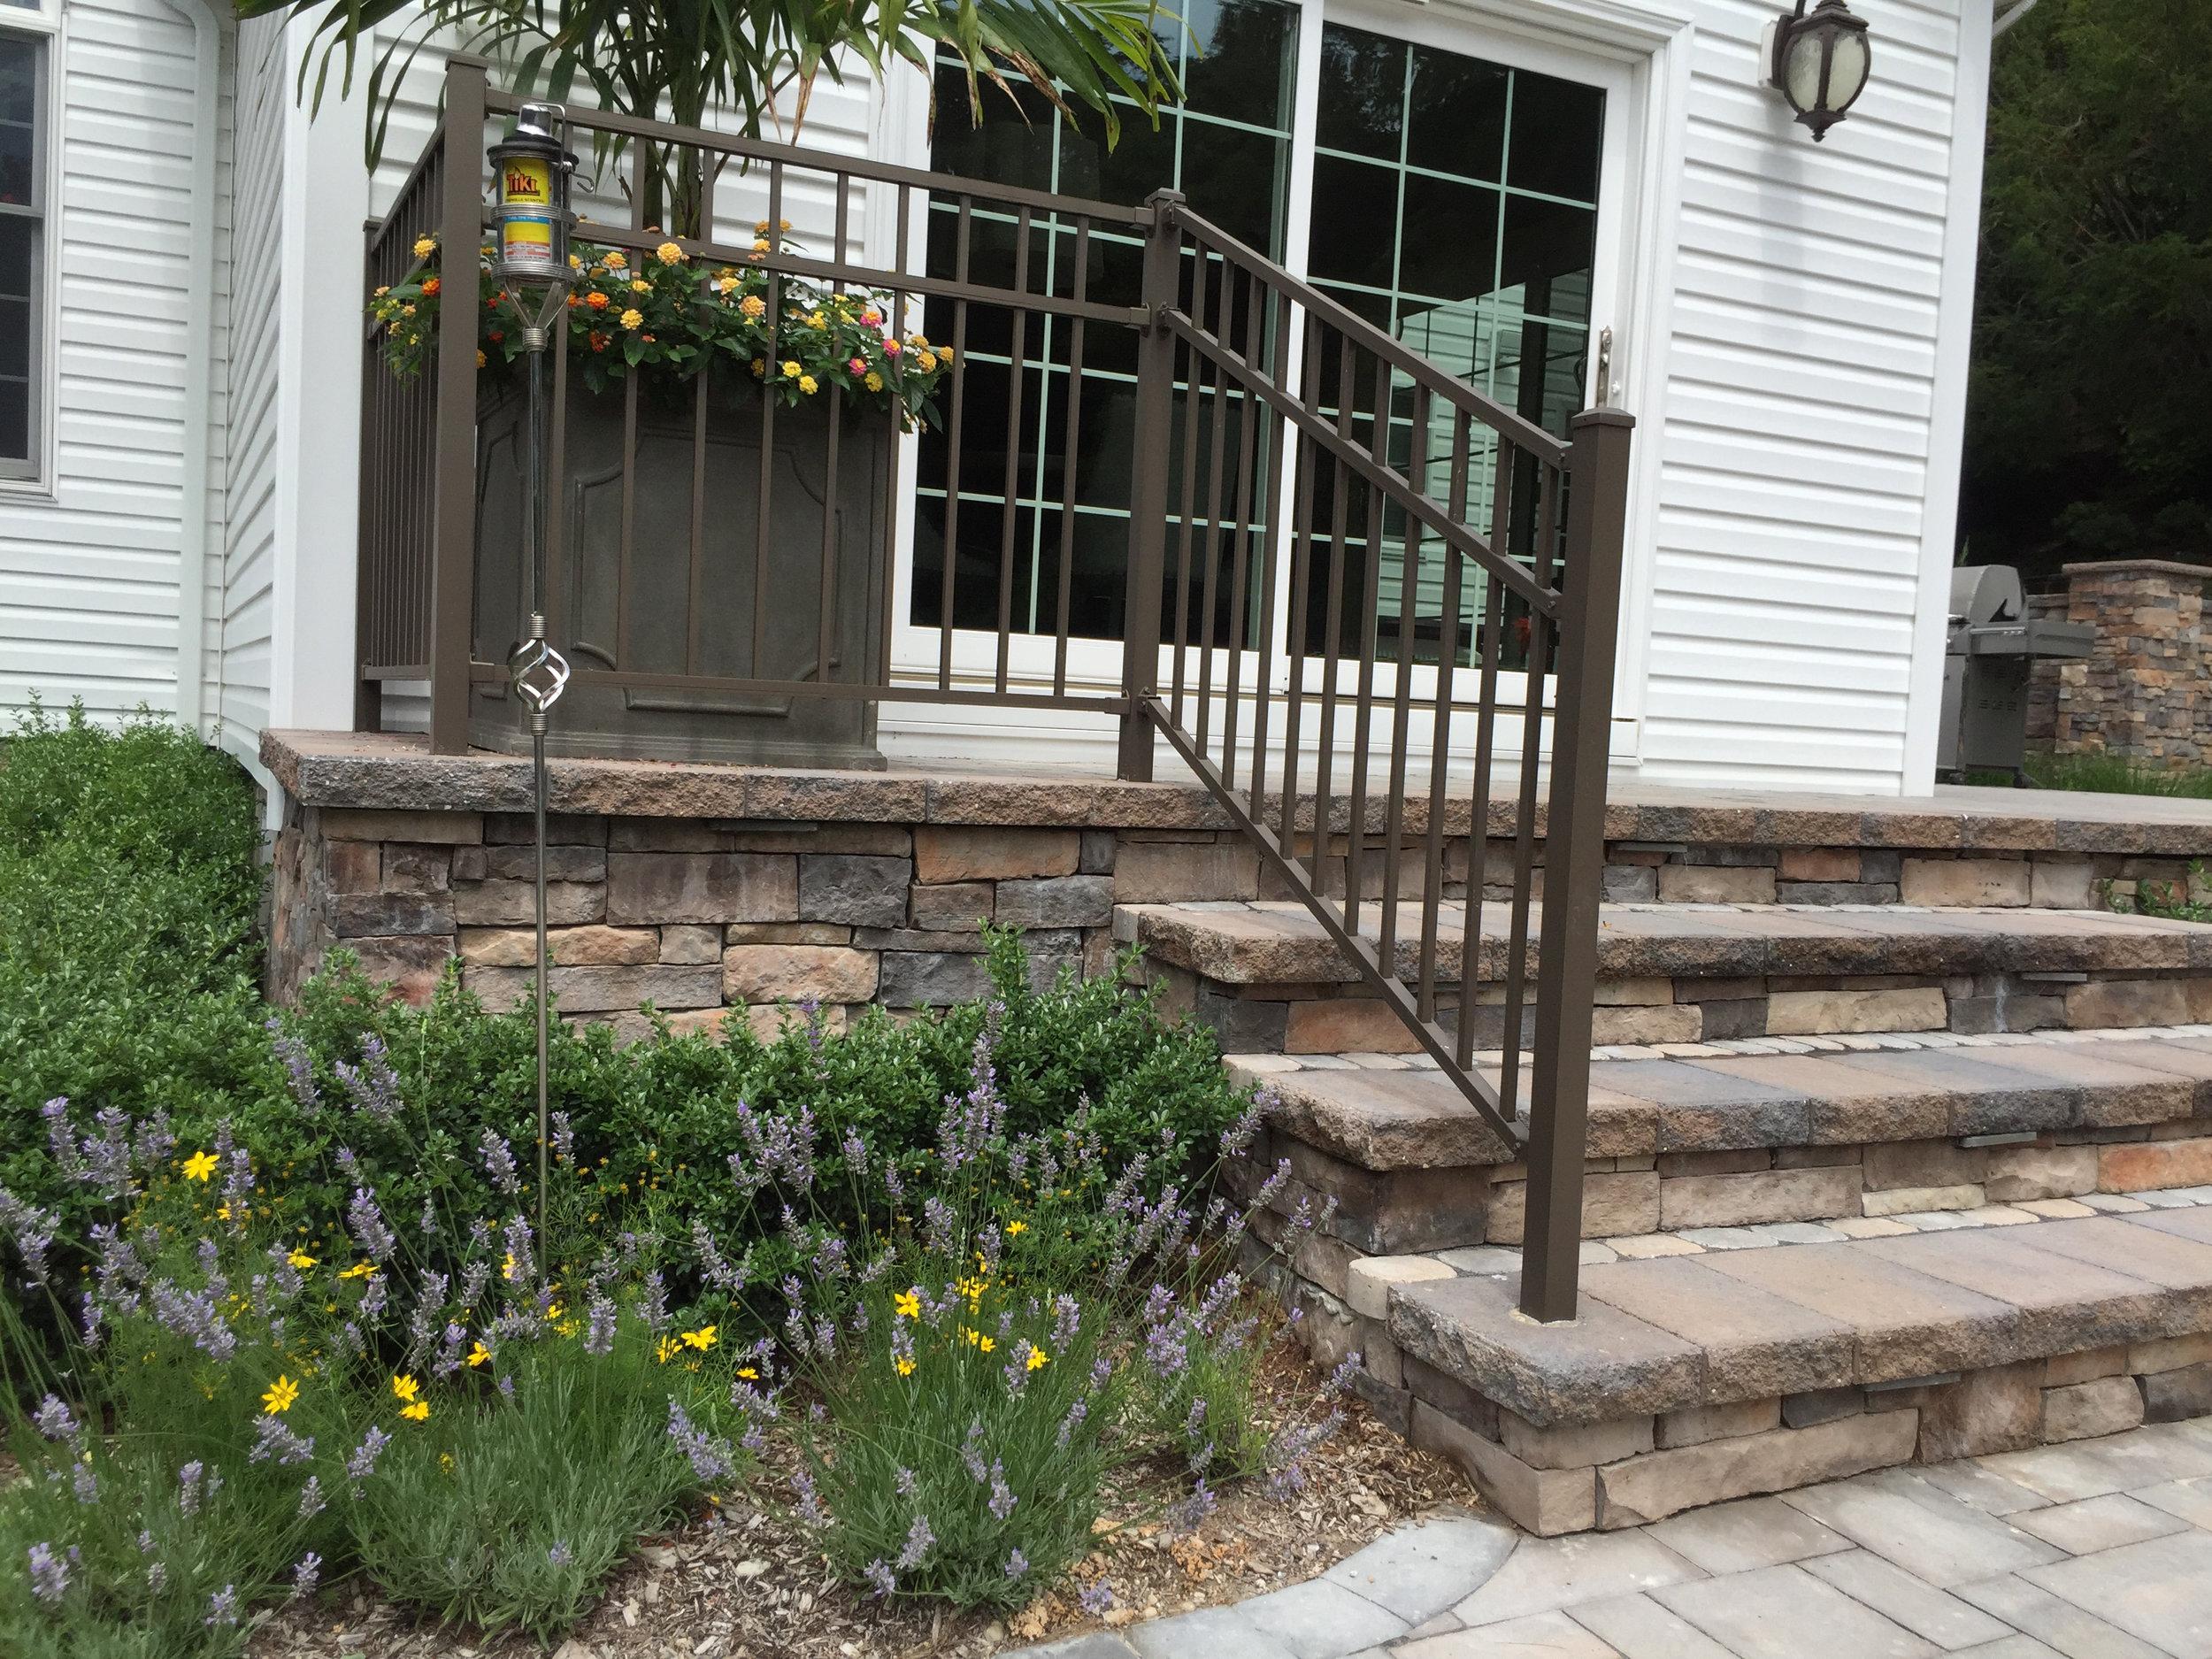 Top landscape shrub design in Long Island, NY